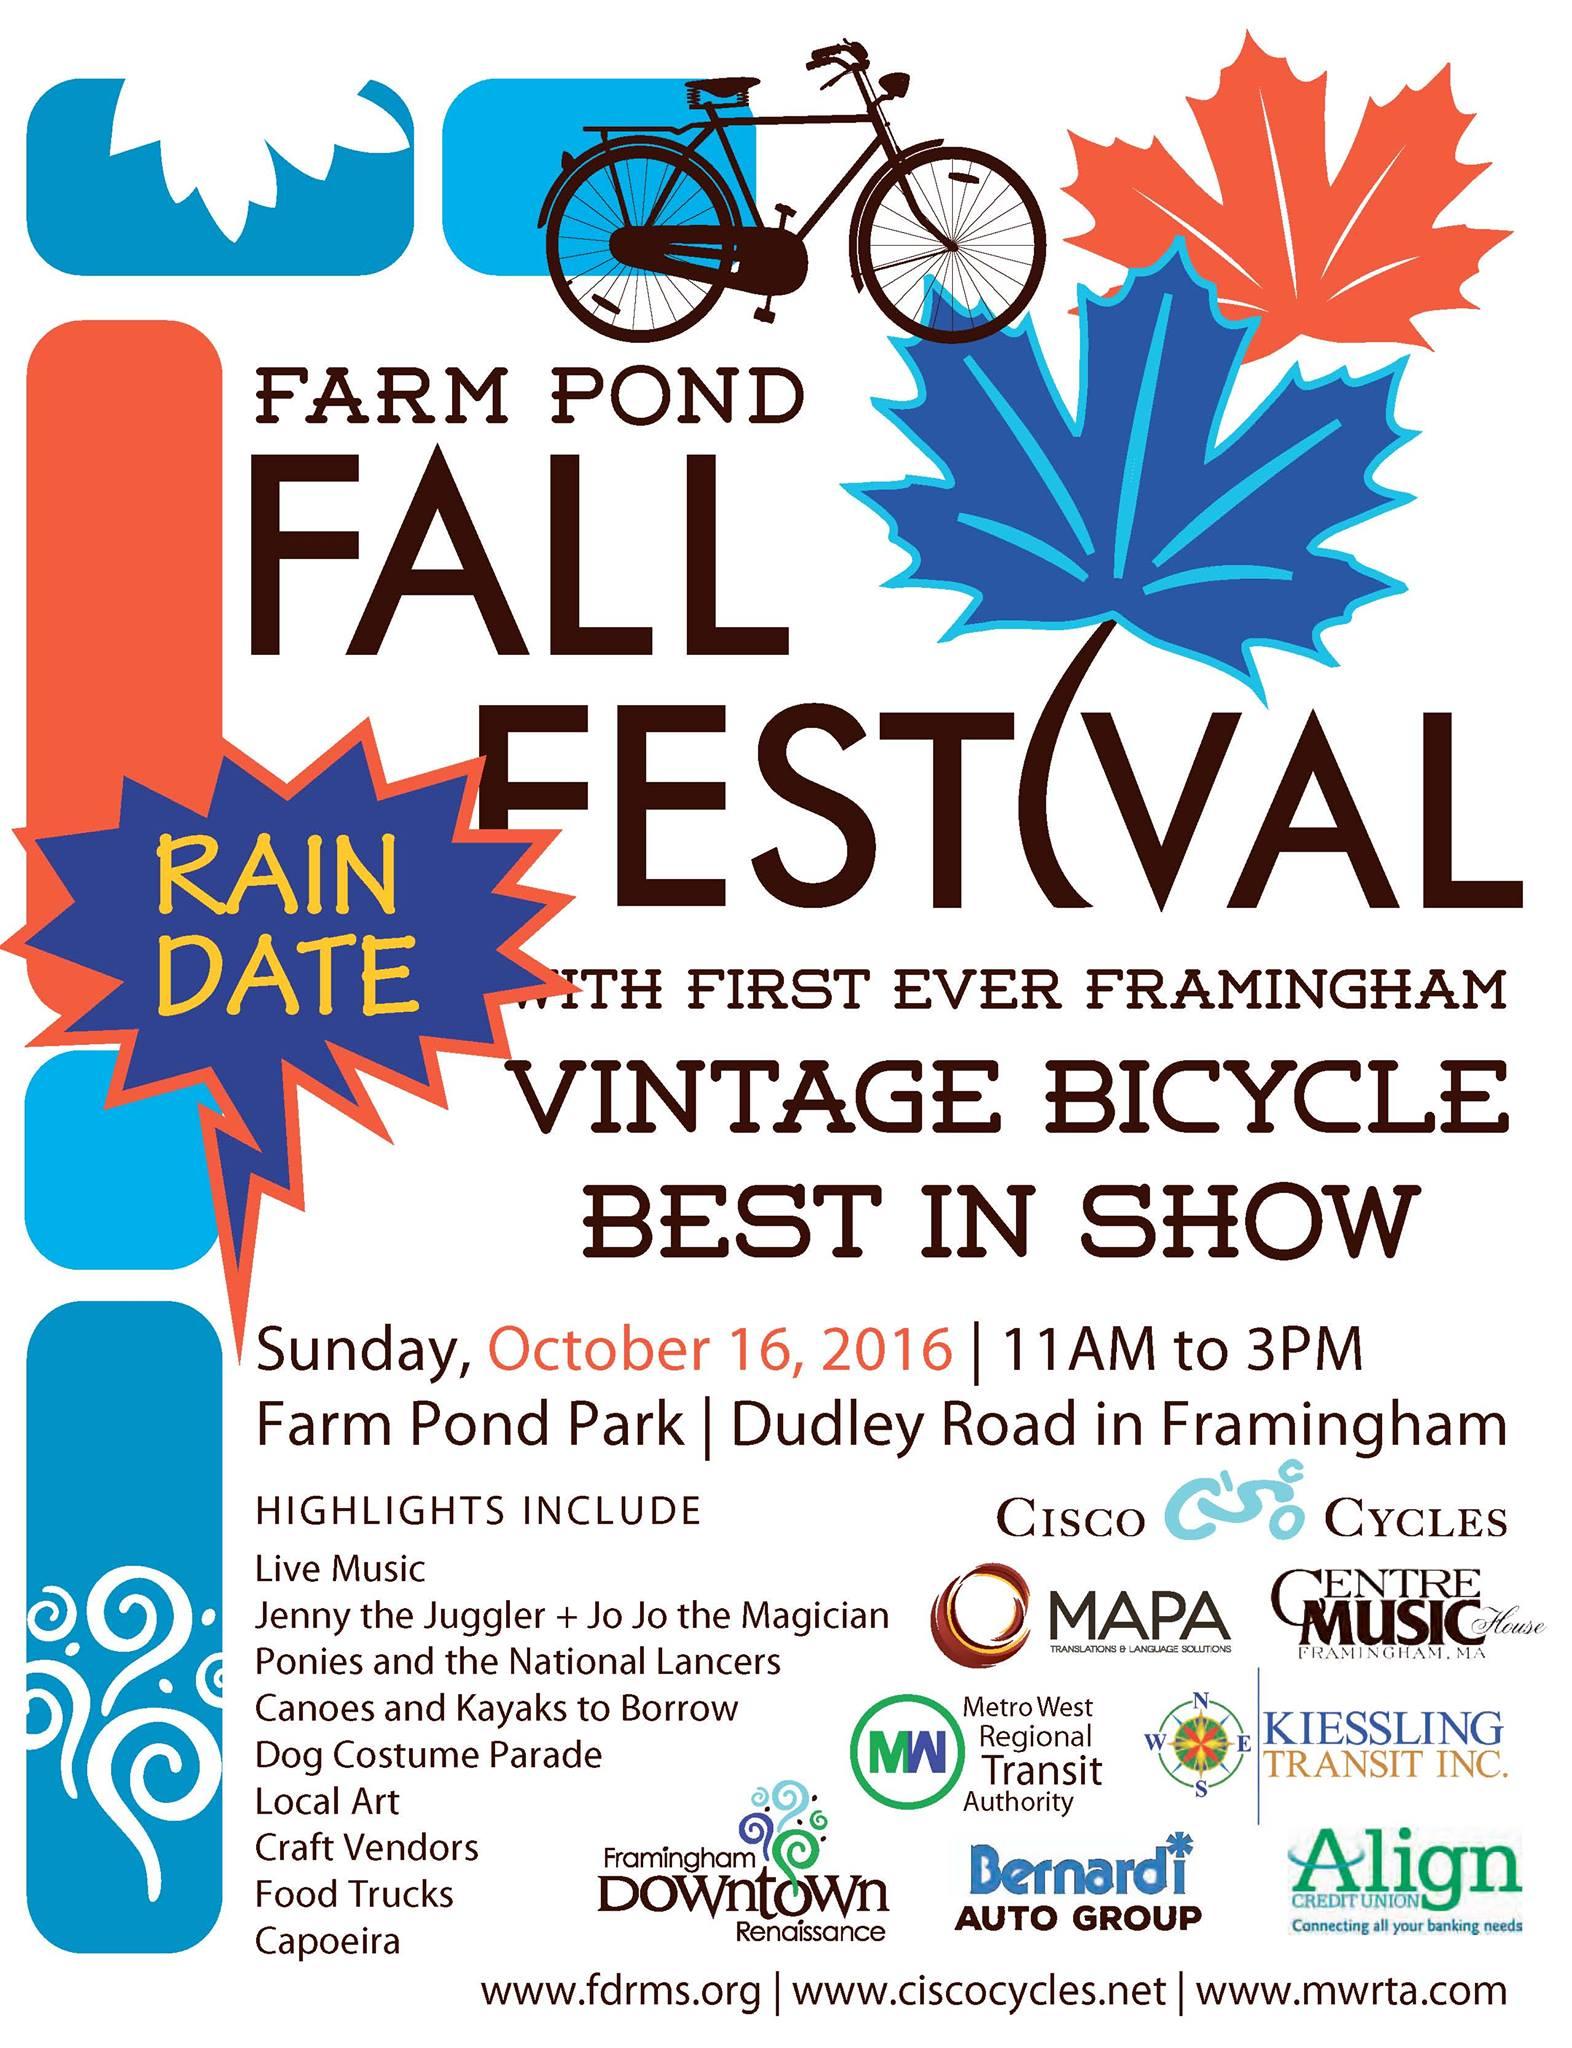 4th Annual Farm Pond Fall Fest